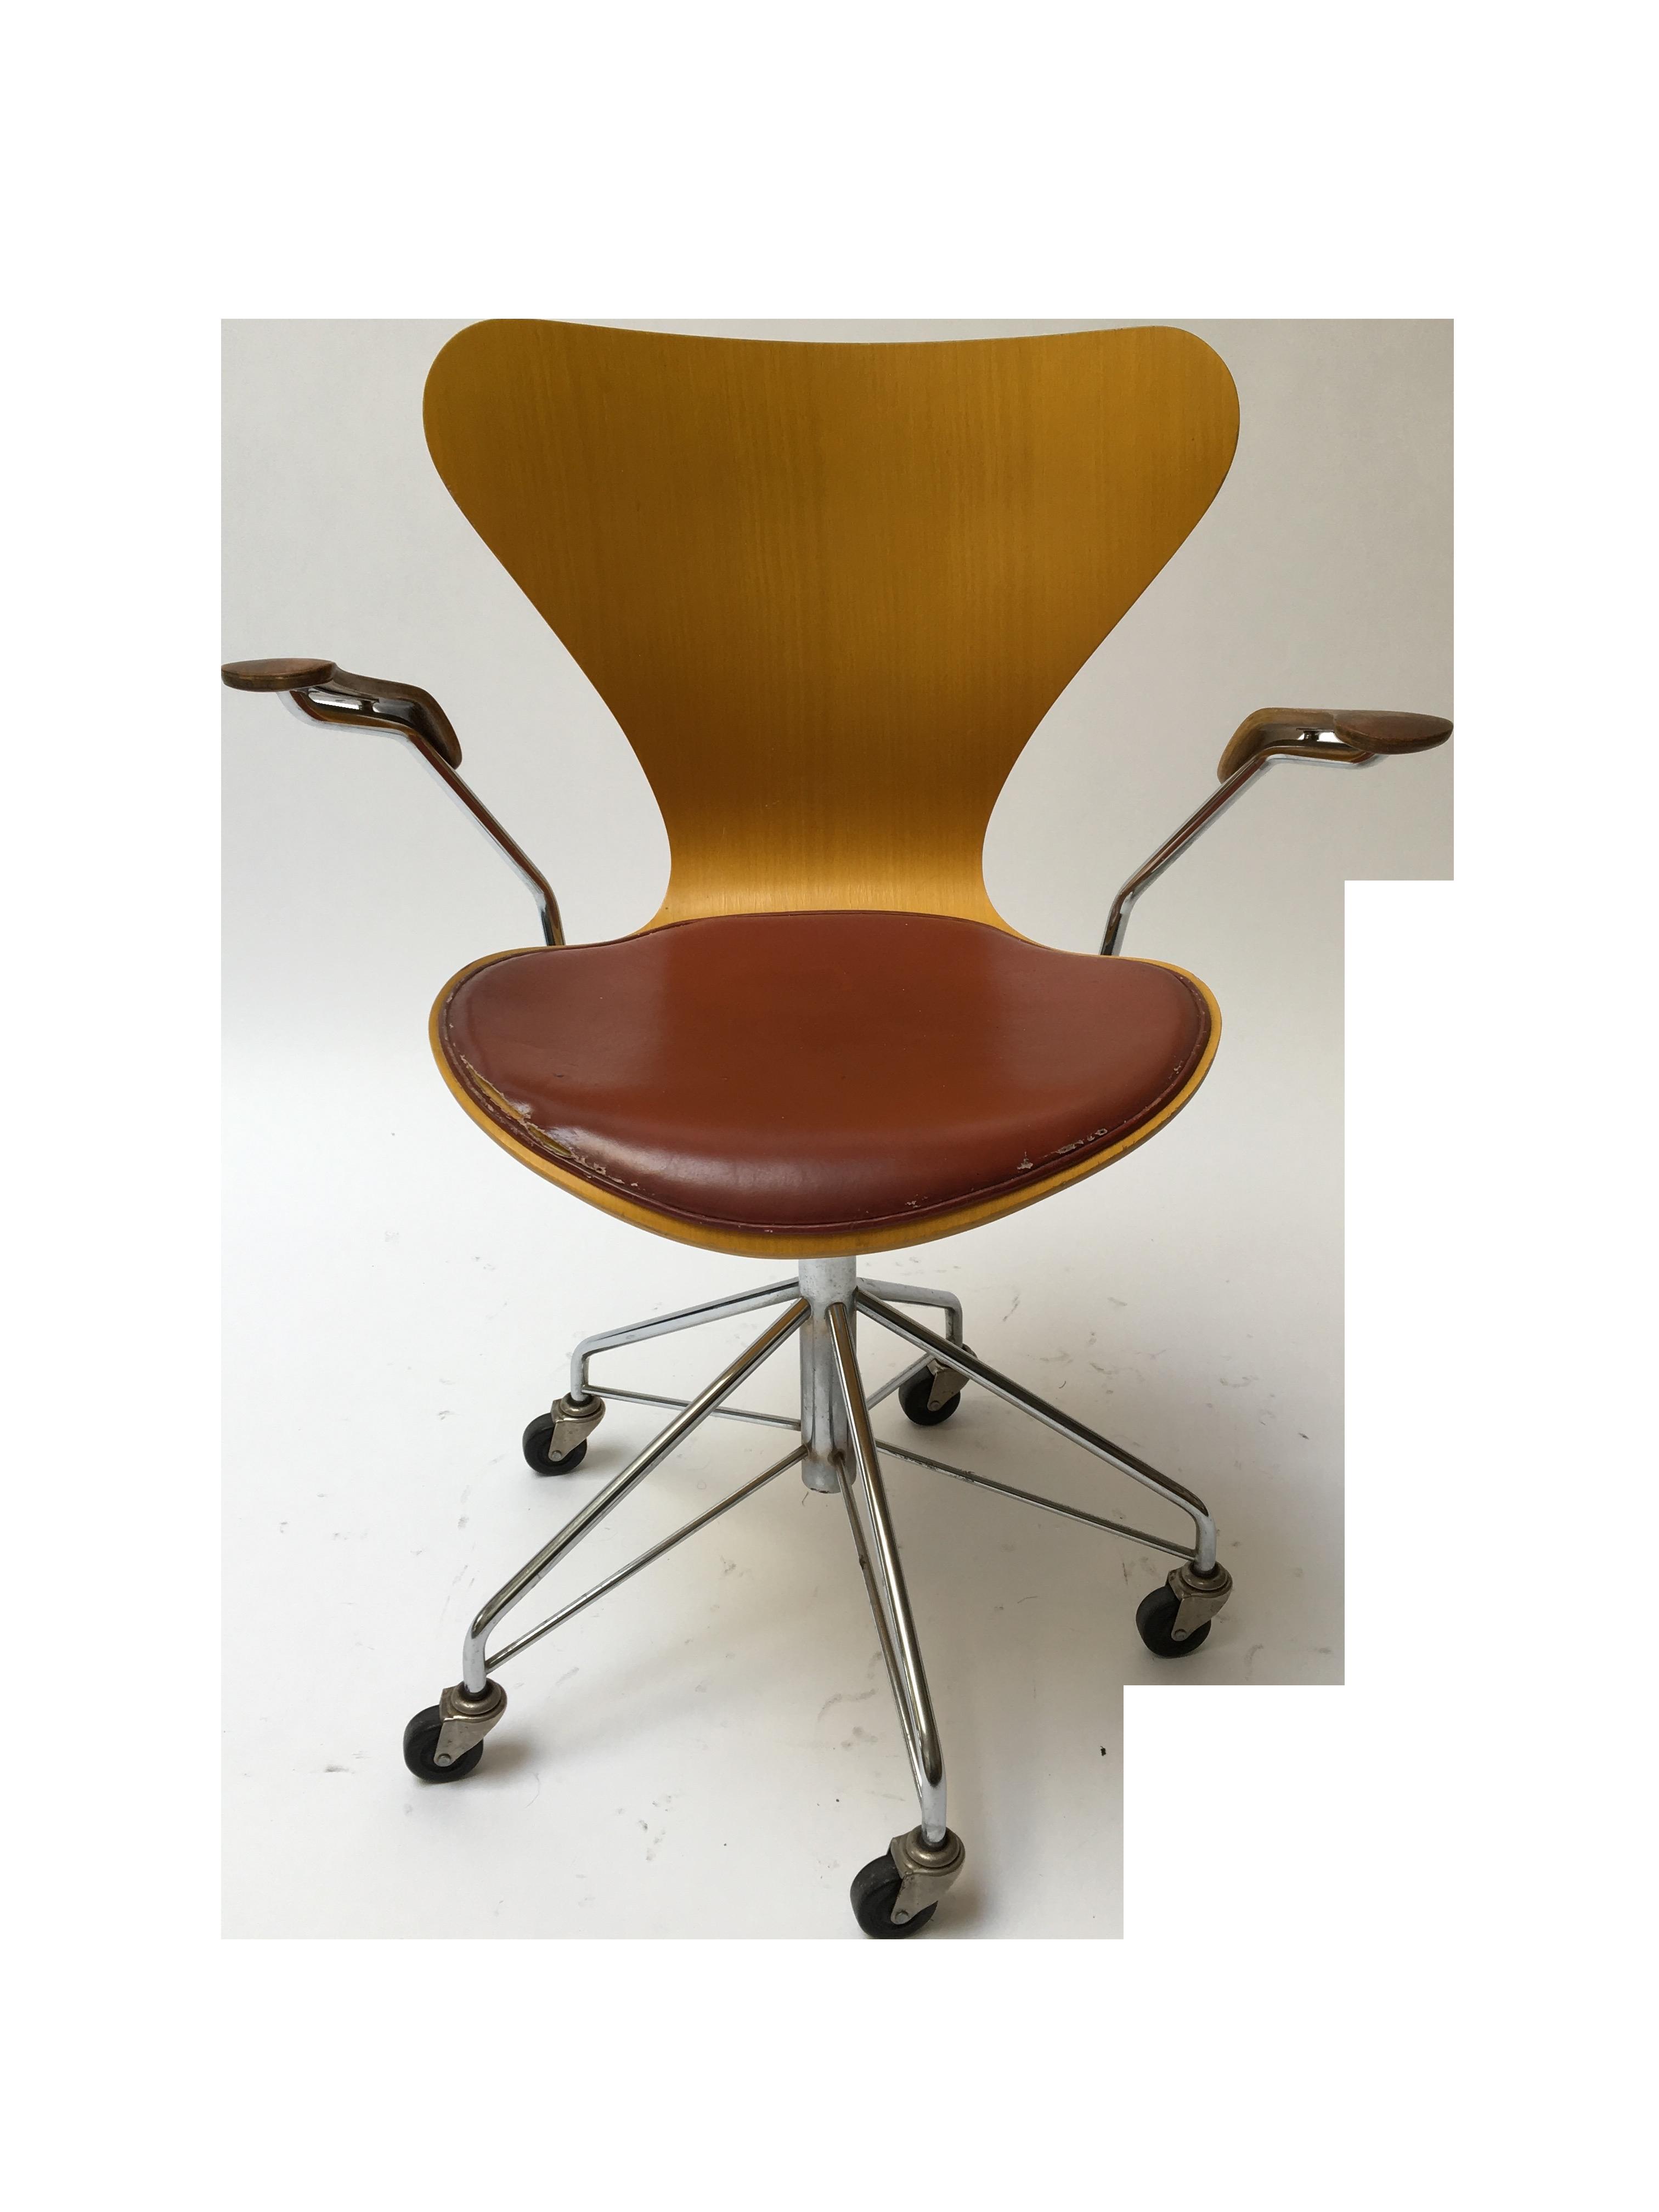 Arne Jacobsen Series 7 Rolling Arm Chair Chairish : 5a9eb44f c44c 42b1 a351 b798d5928d9easpectfitampwidth640ampheight640 from www.chairish.com size 640 x 640 jpeg 20kB